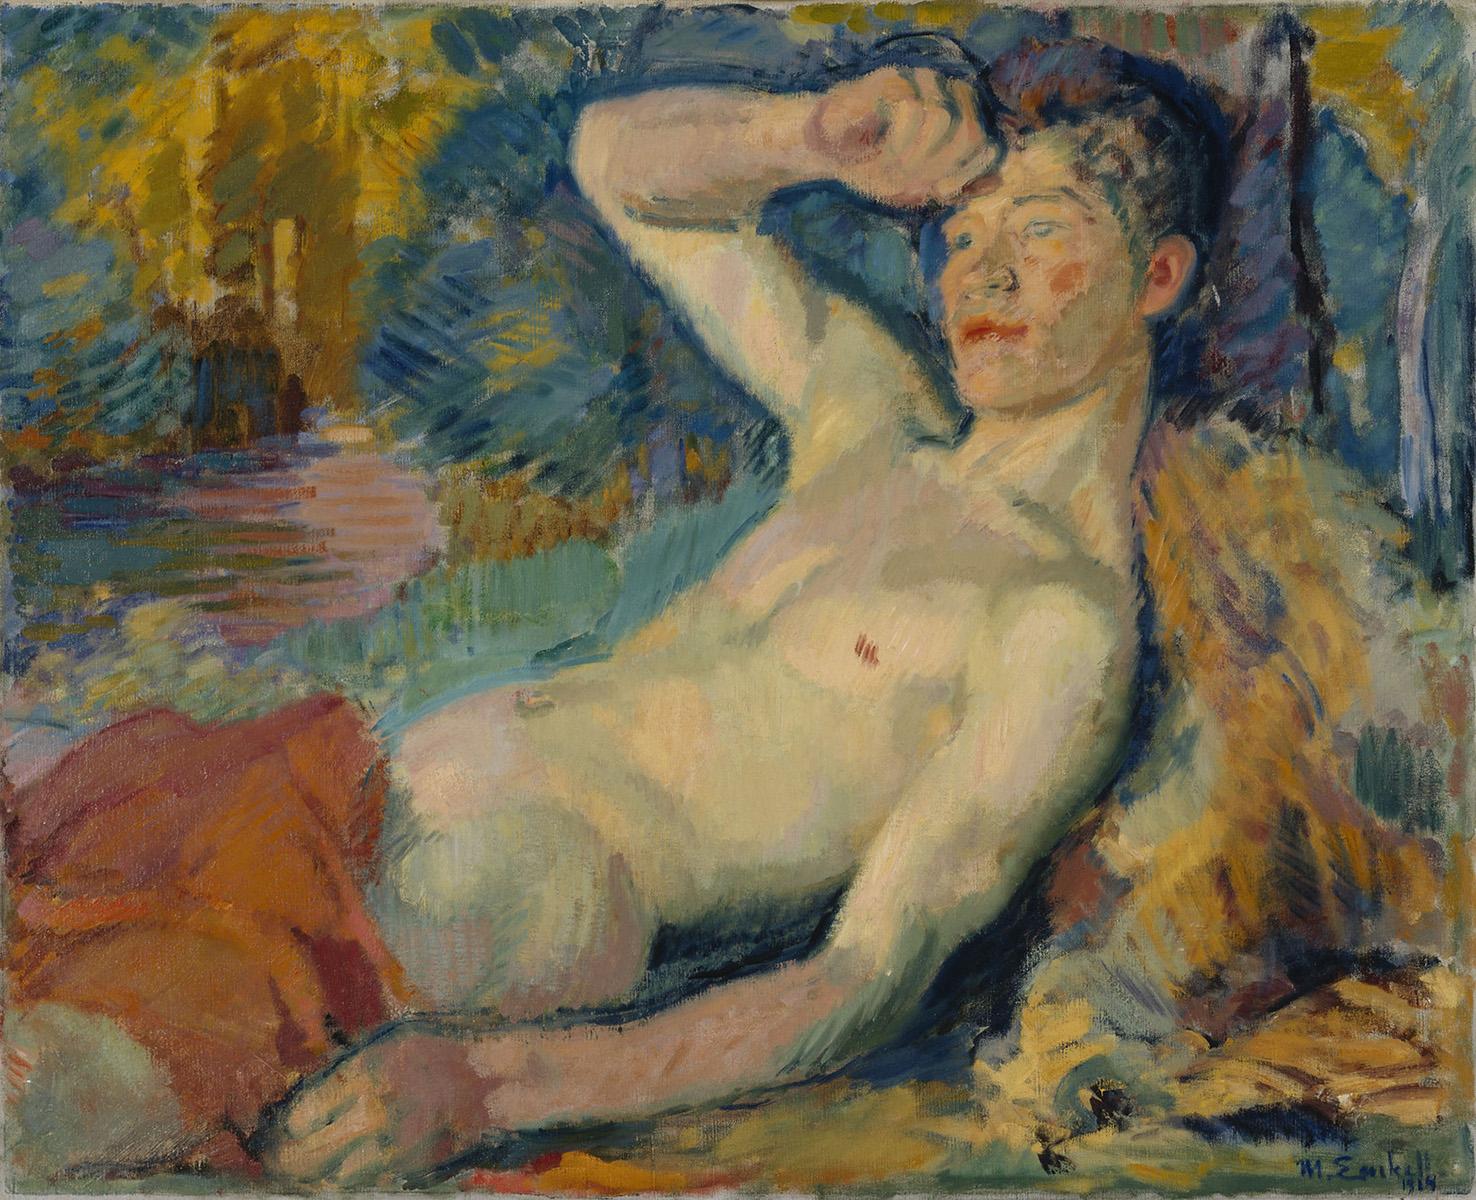 Enckell, Magnus (1870-1925) - 1914 - Fauno